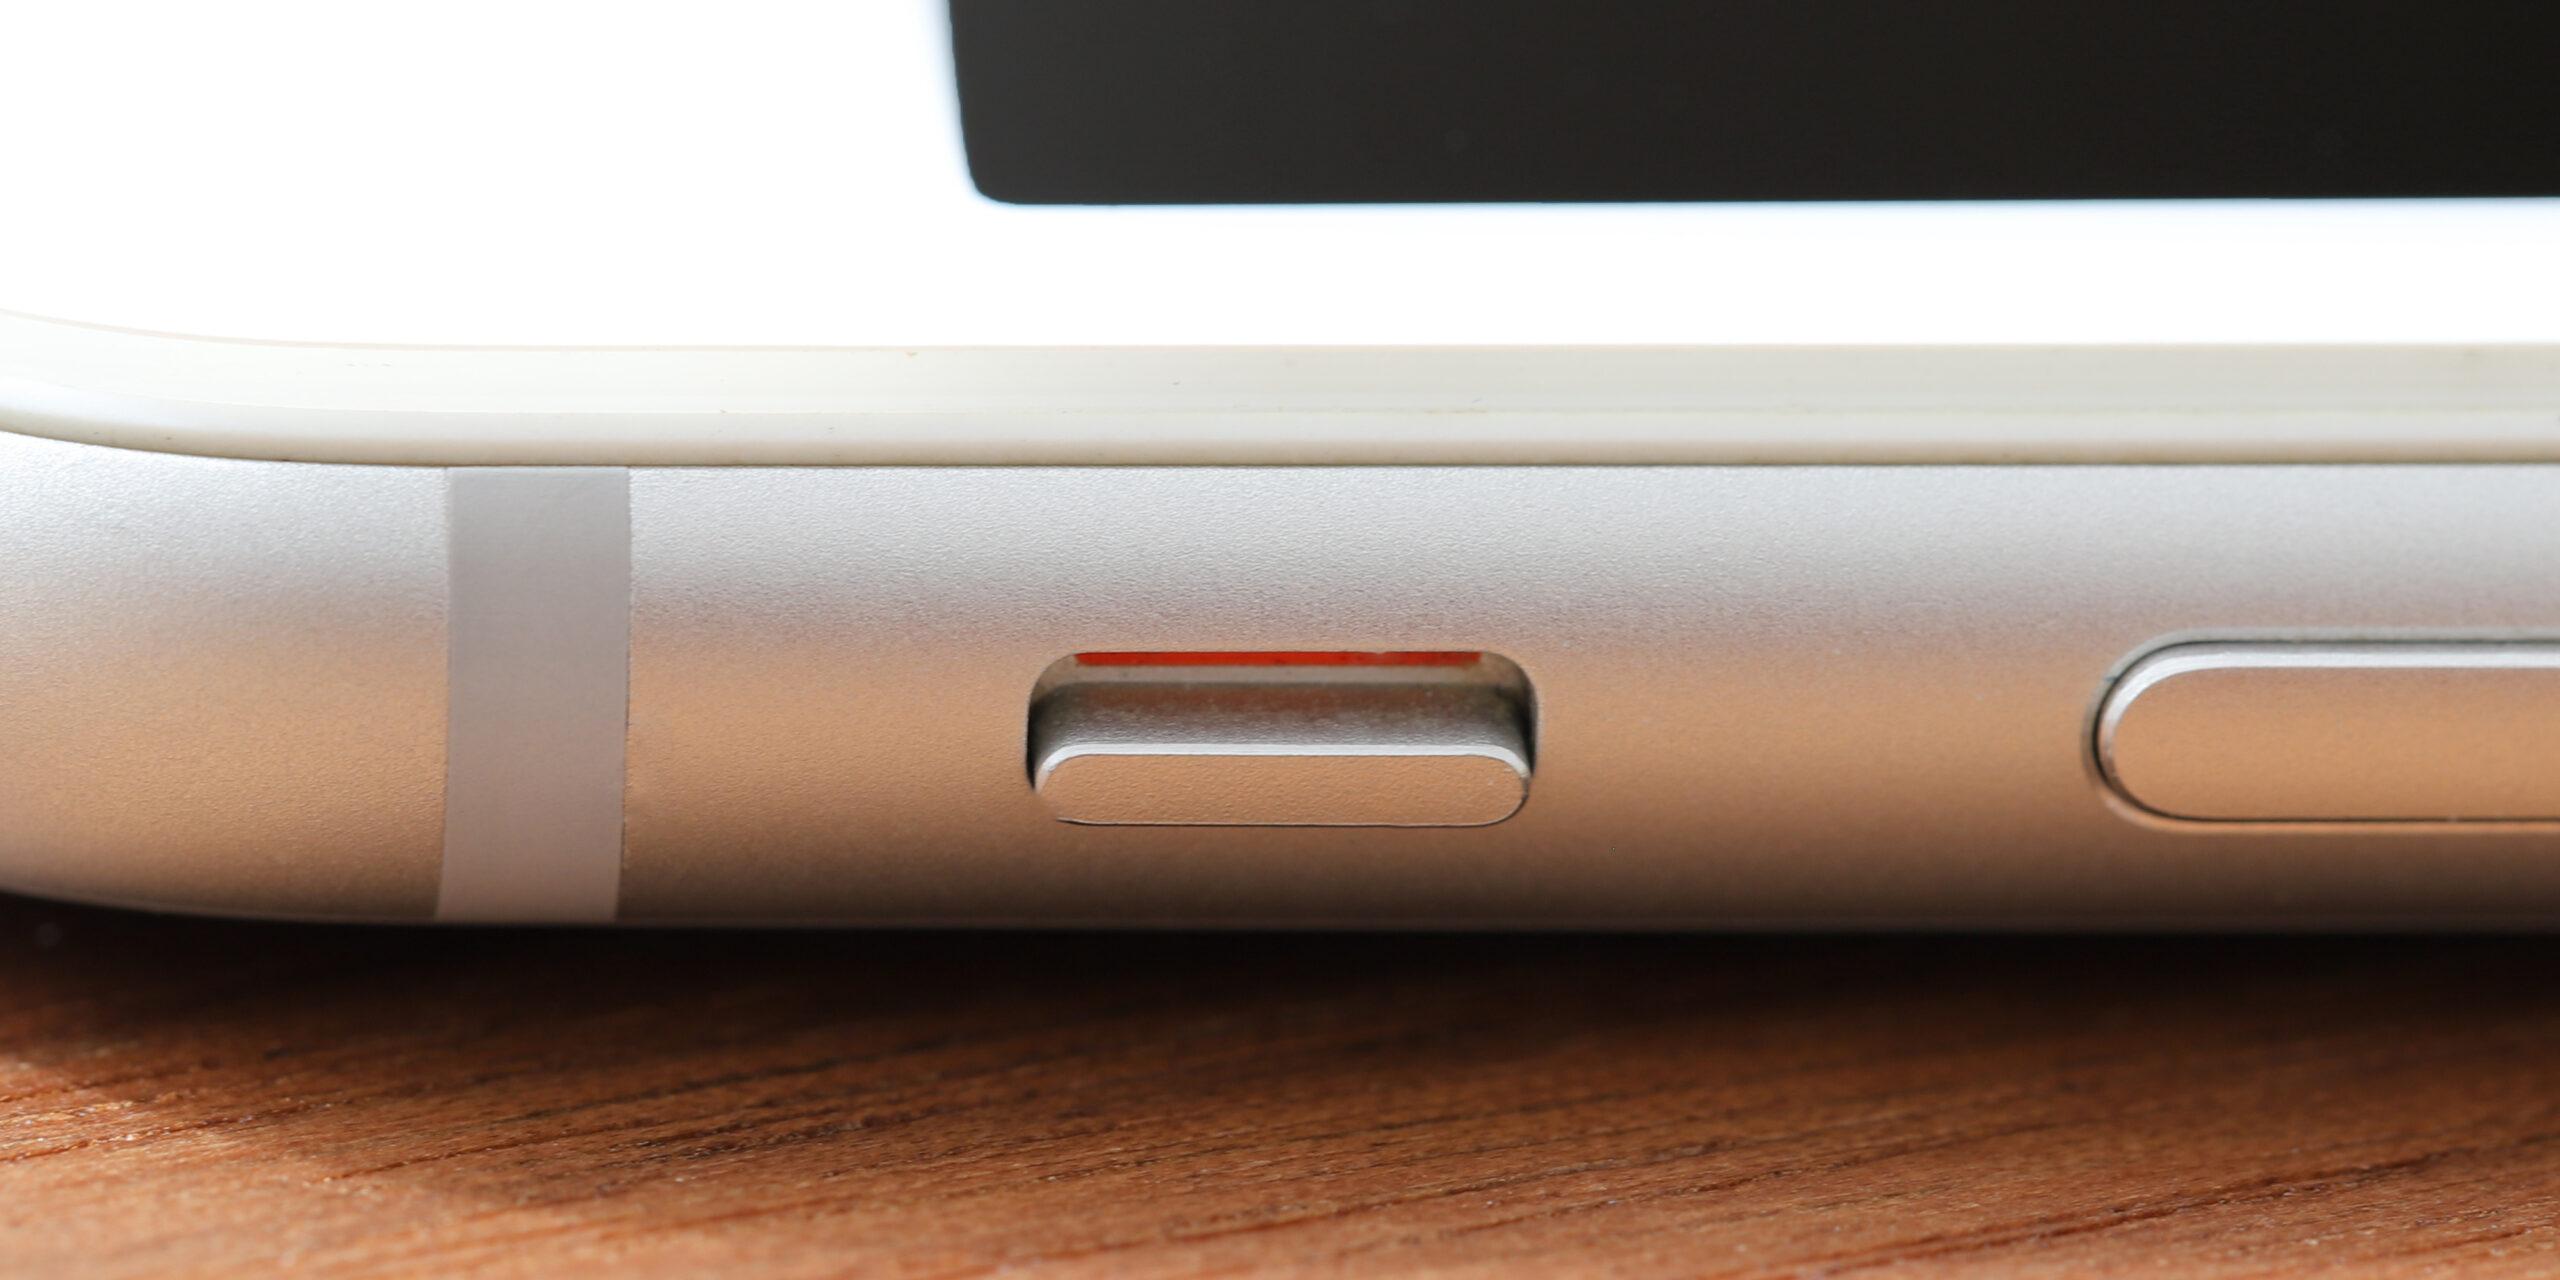 iPhoneのマナーモードスイッチ